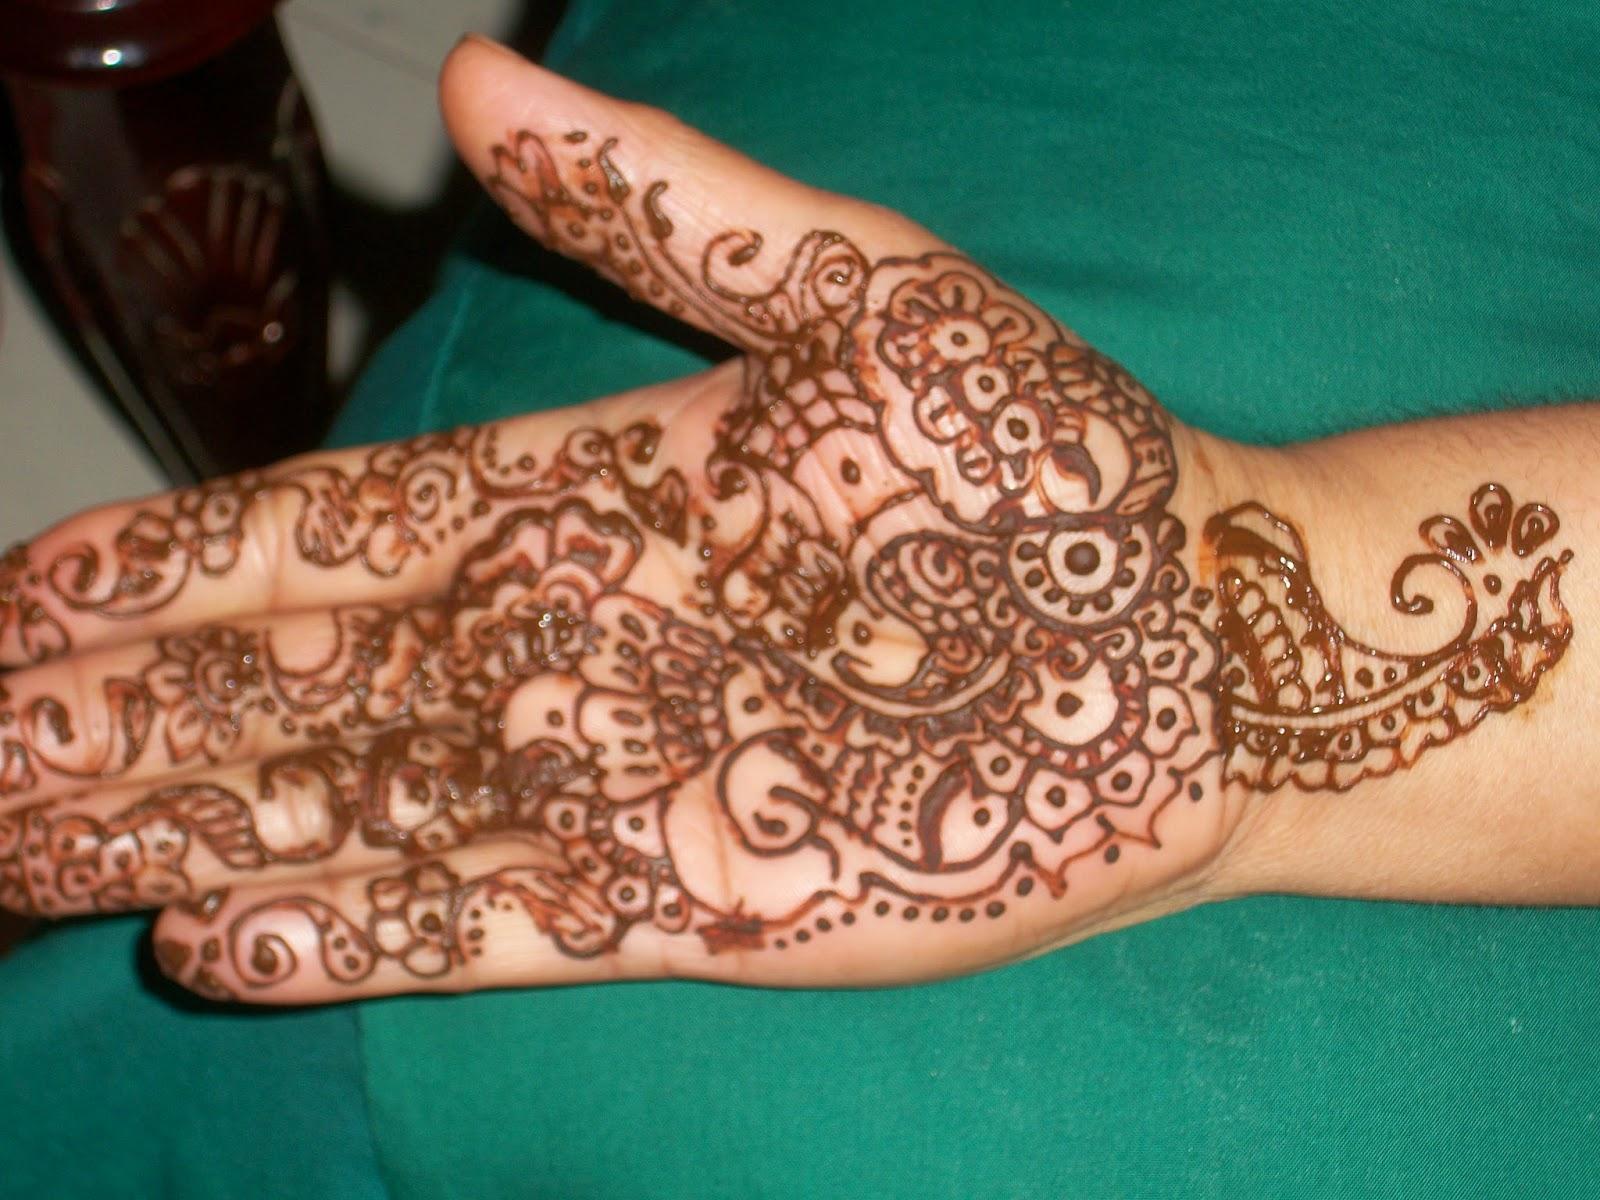 Elegant Henna Patterns for Hands Mehndi Designs Wallpapers Free Download